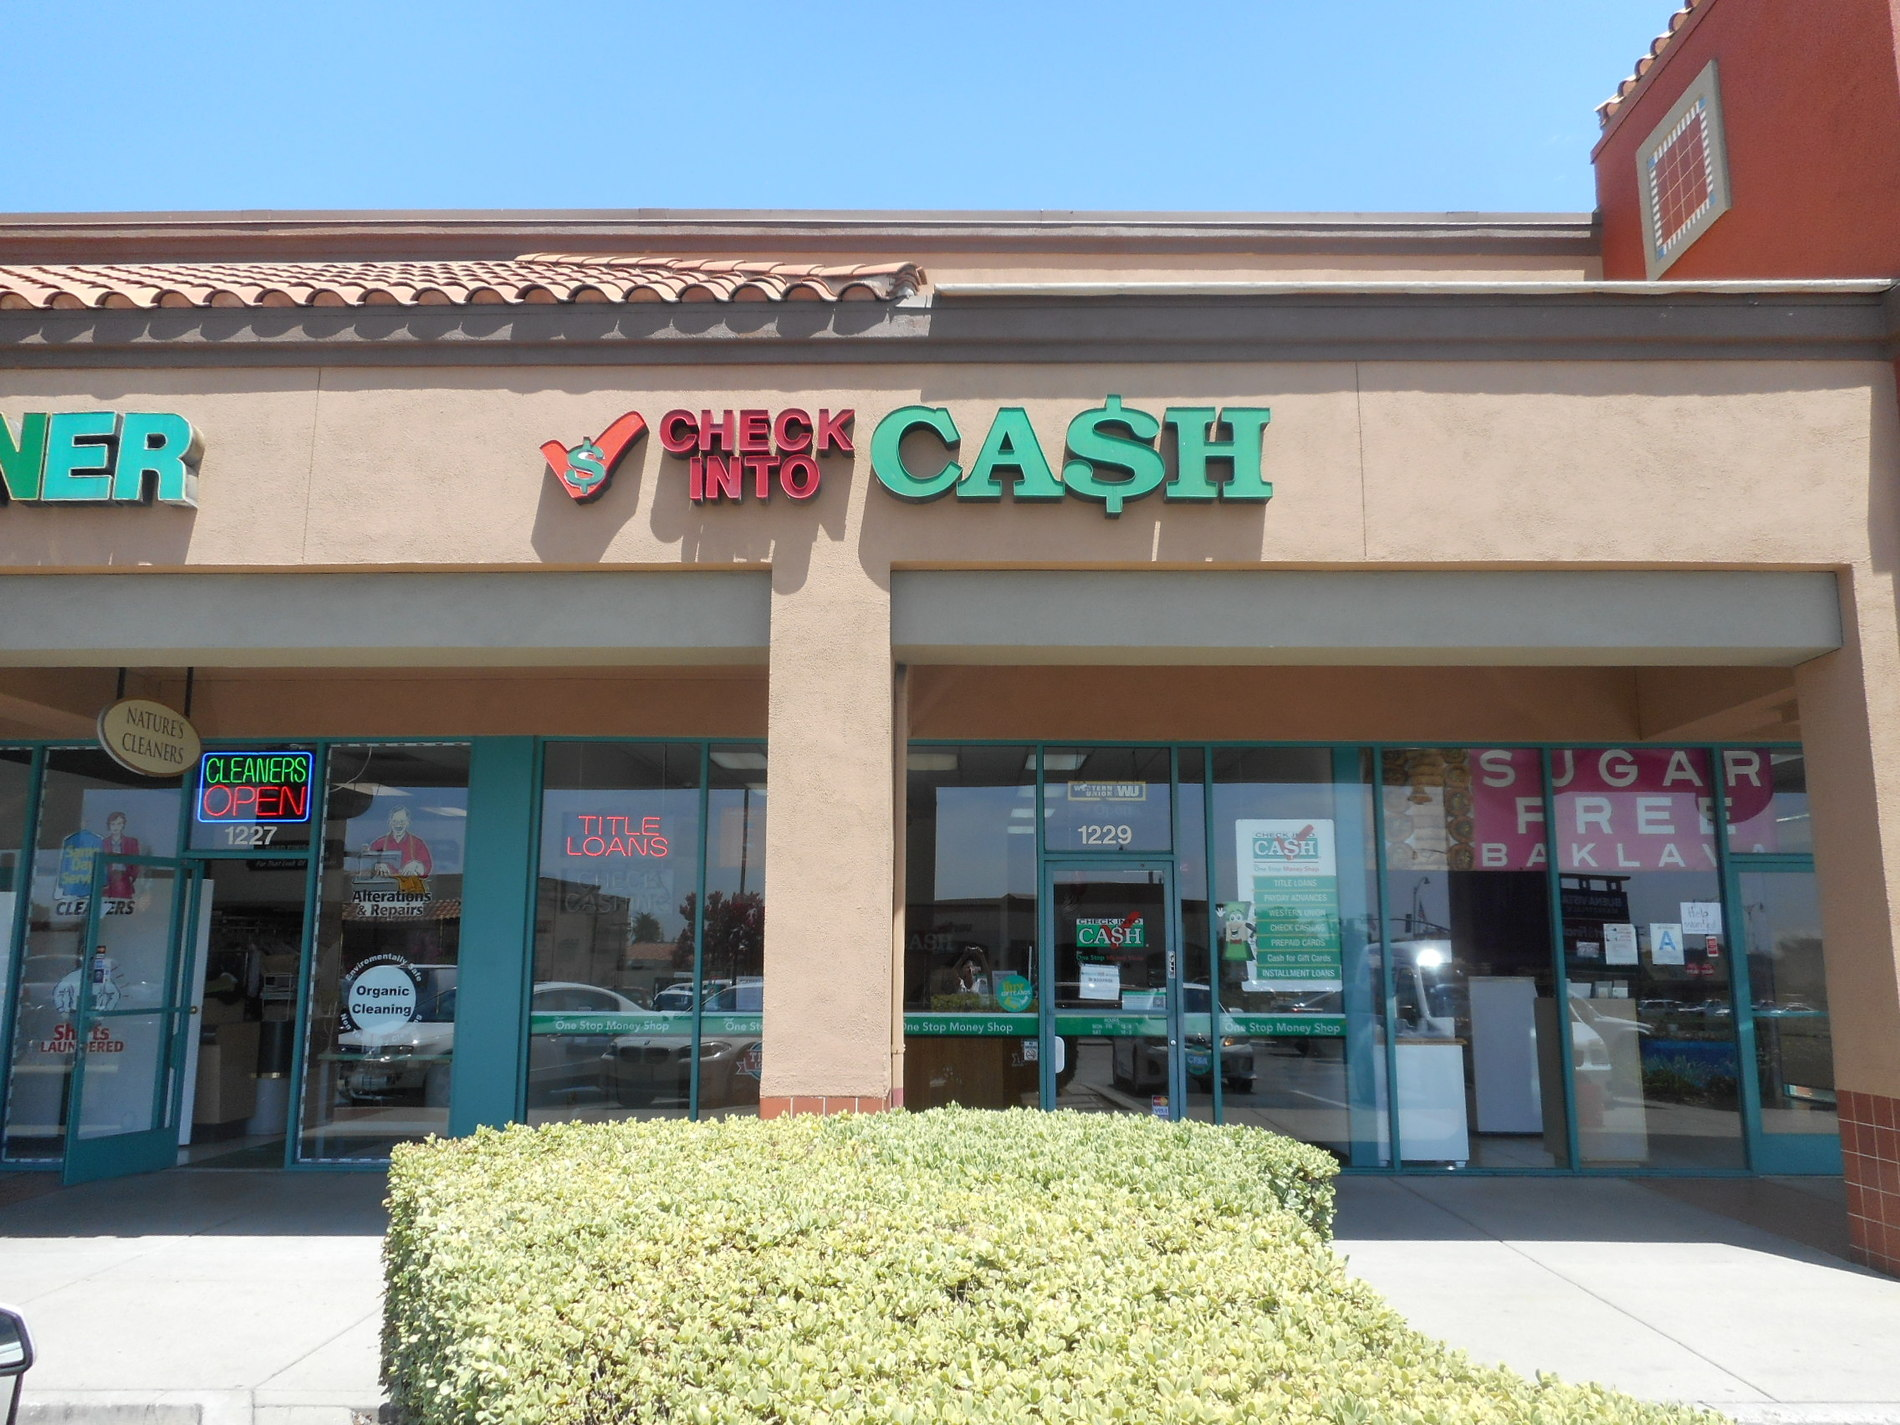 Cash advance model image 4